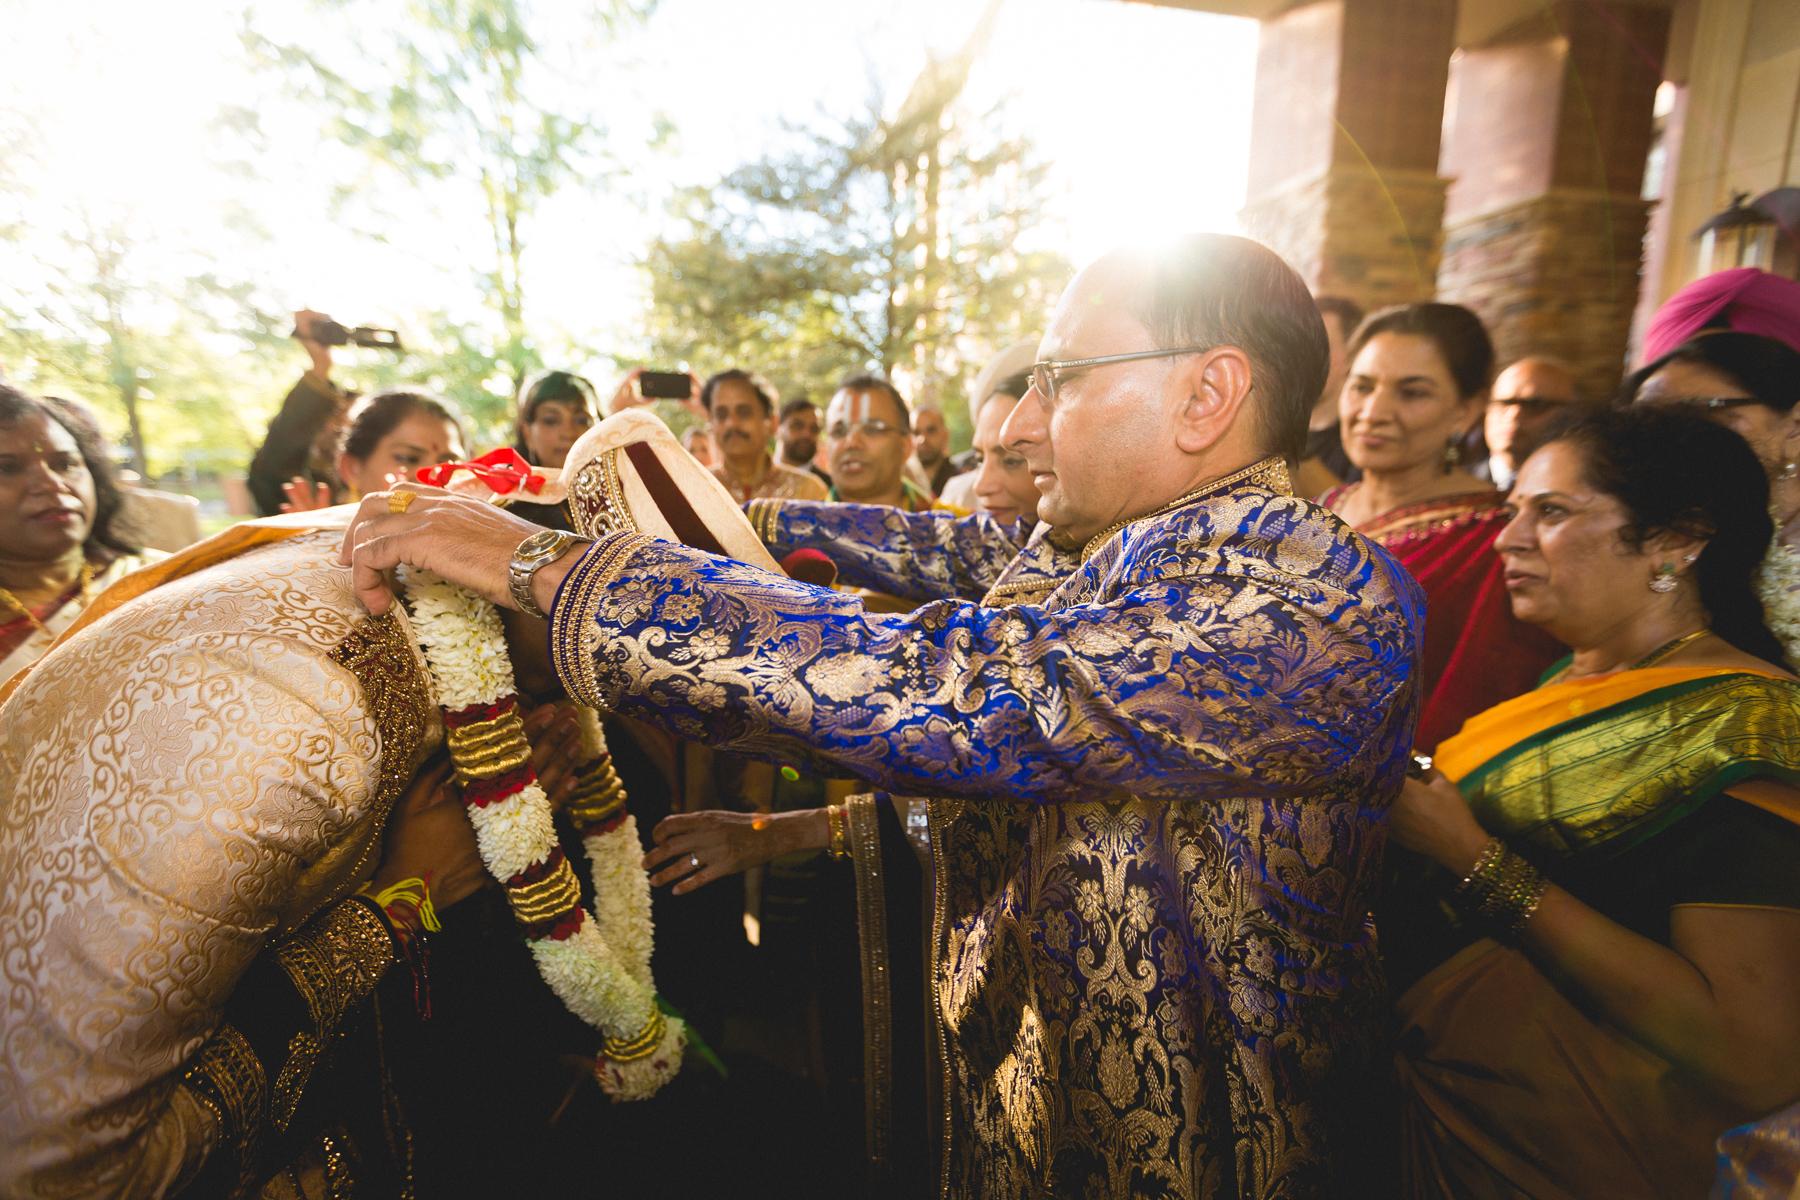 edward-b-photography-indian-wedding-29.jpg